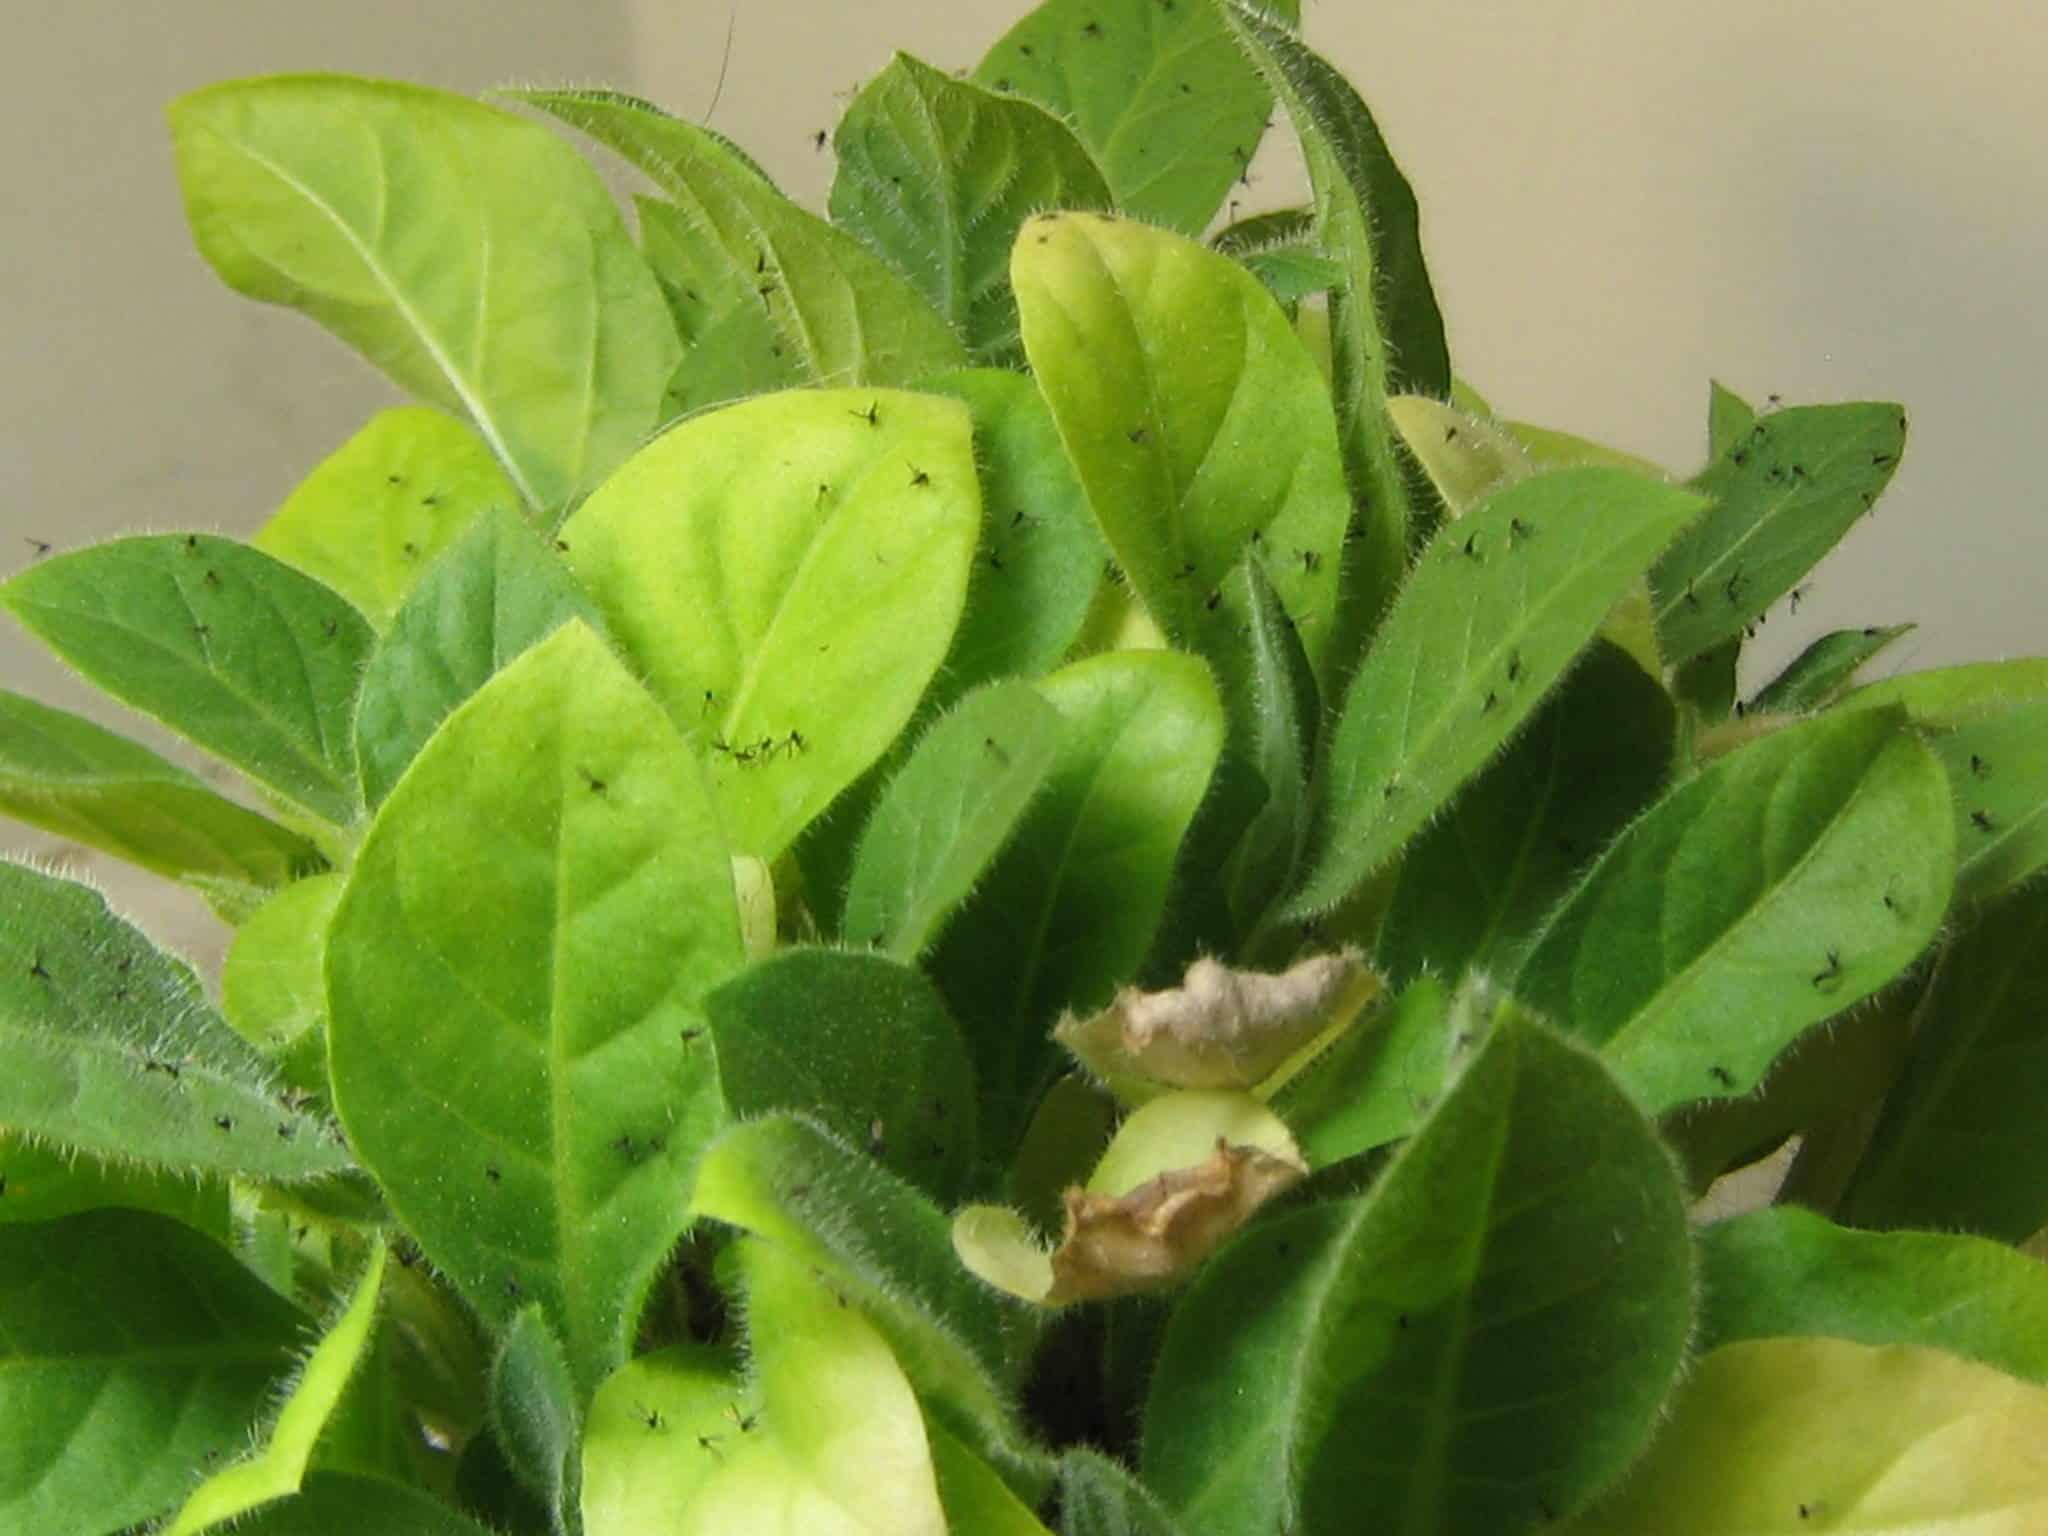 Fungus gnats in flower pots